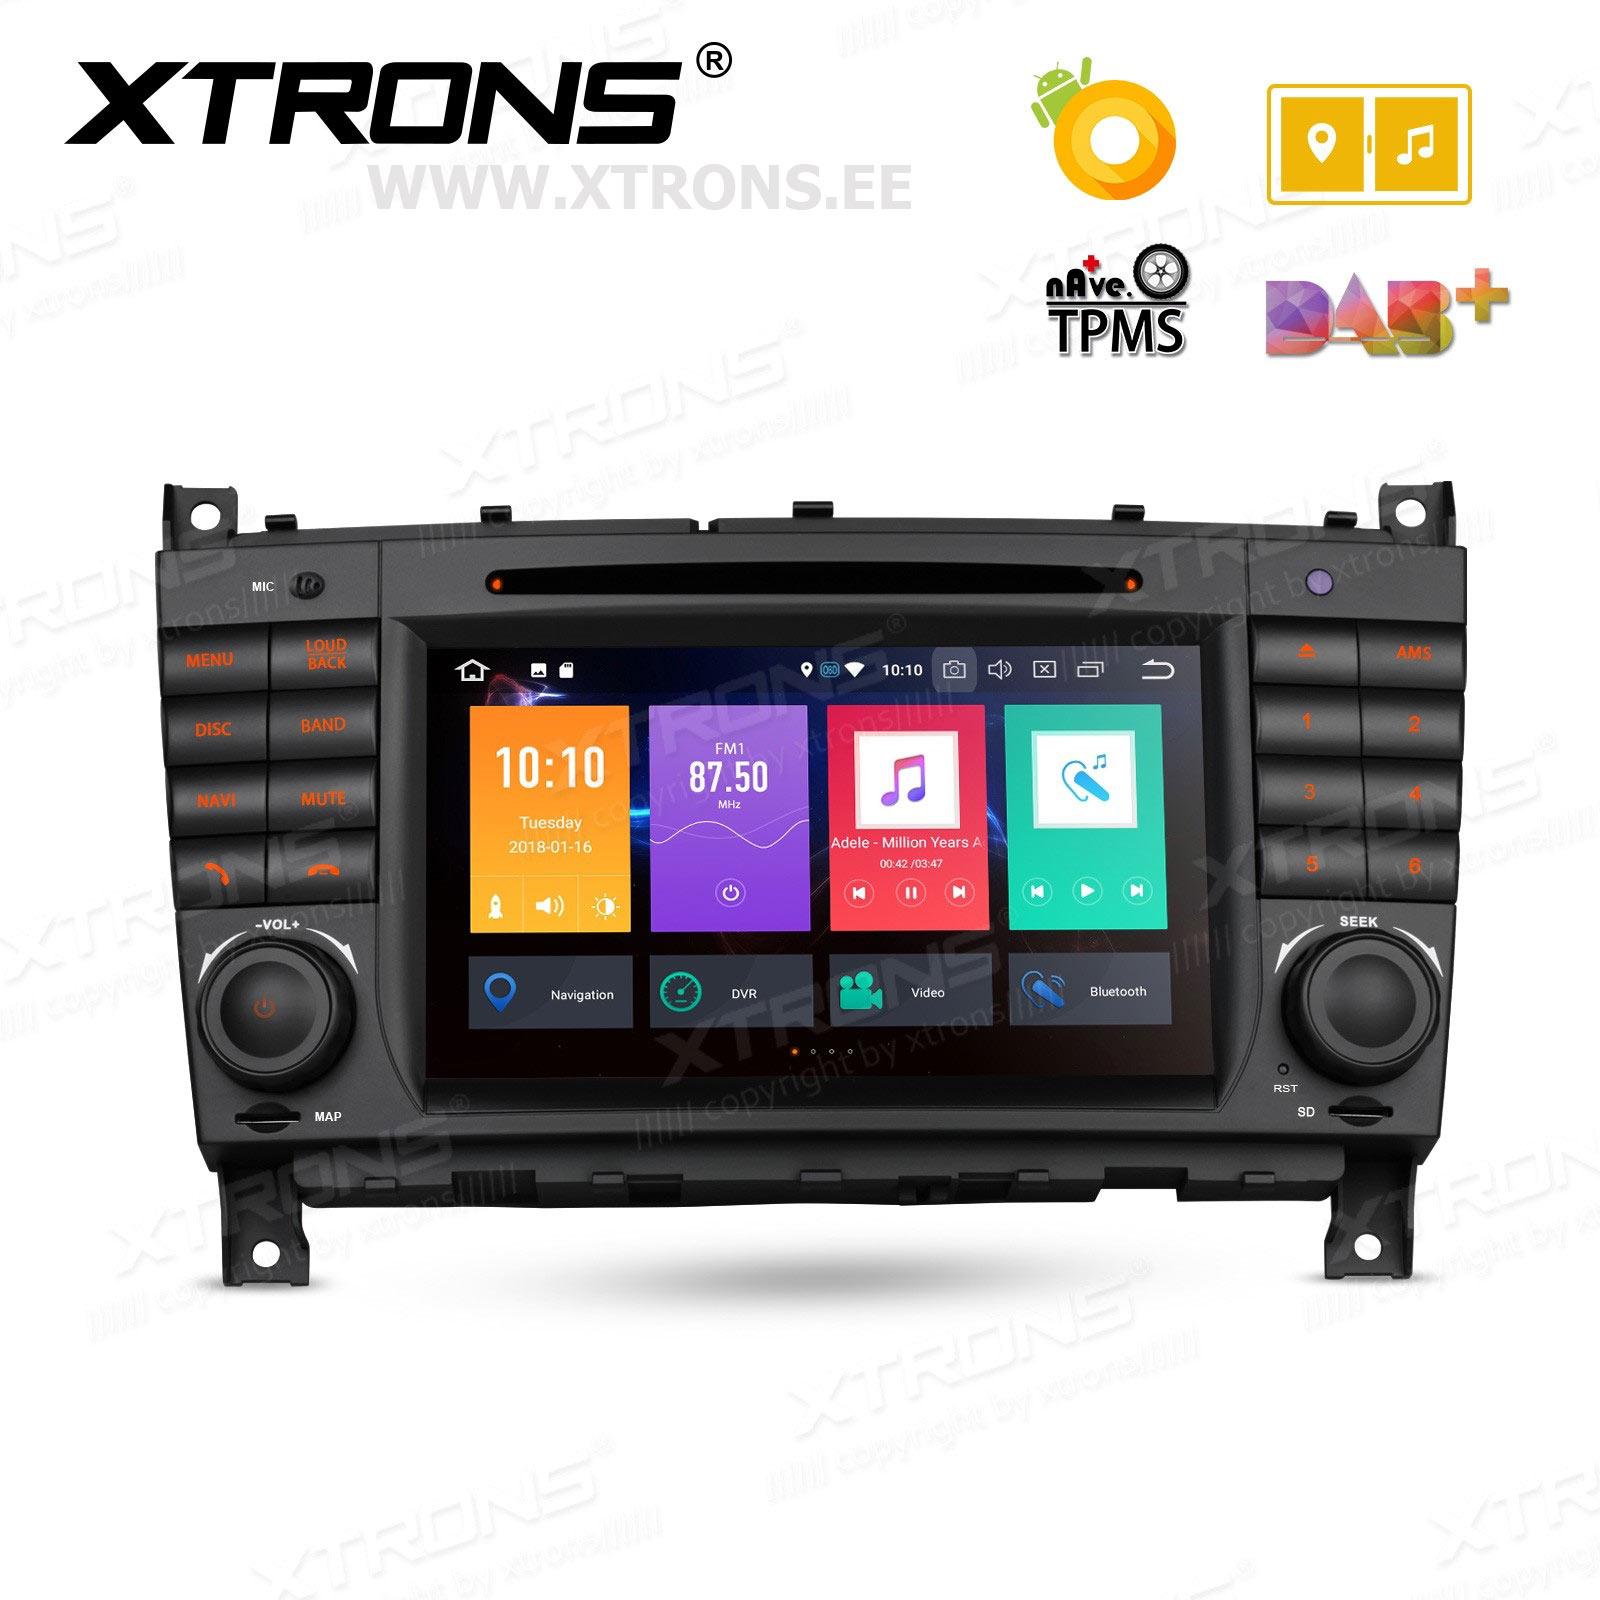 XTRONS PB78M209P